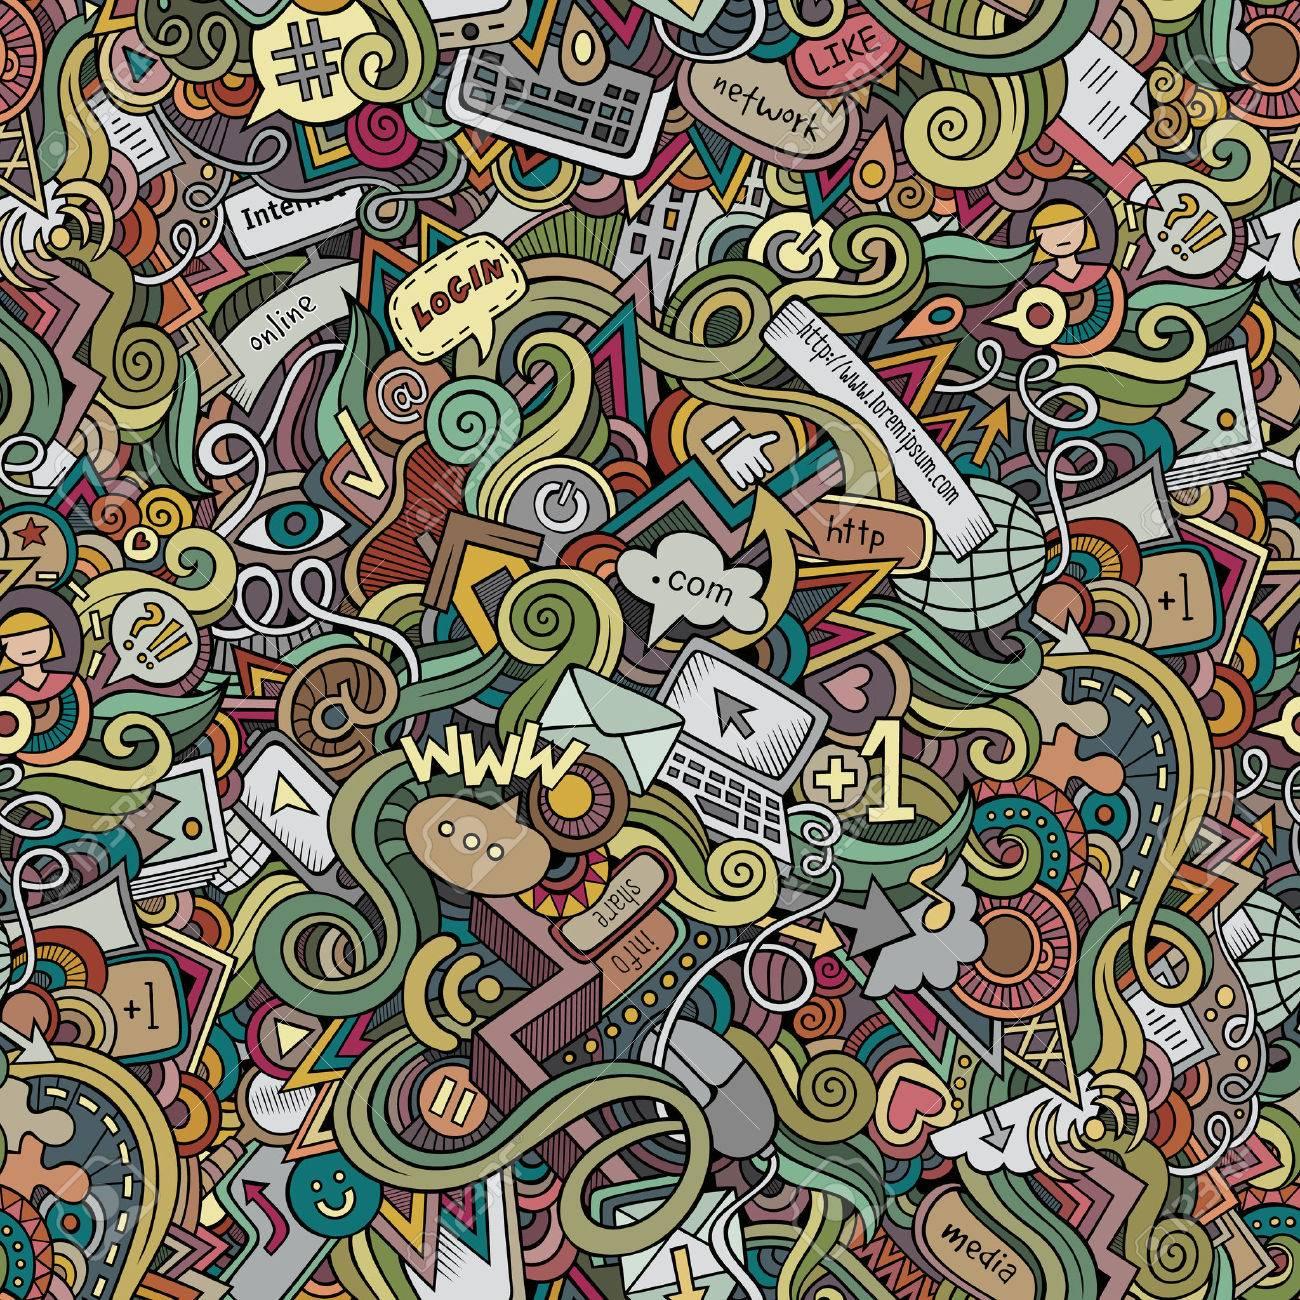 Cartoon vector doodles hand drawn internet social media seamless pattern - 41389374